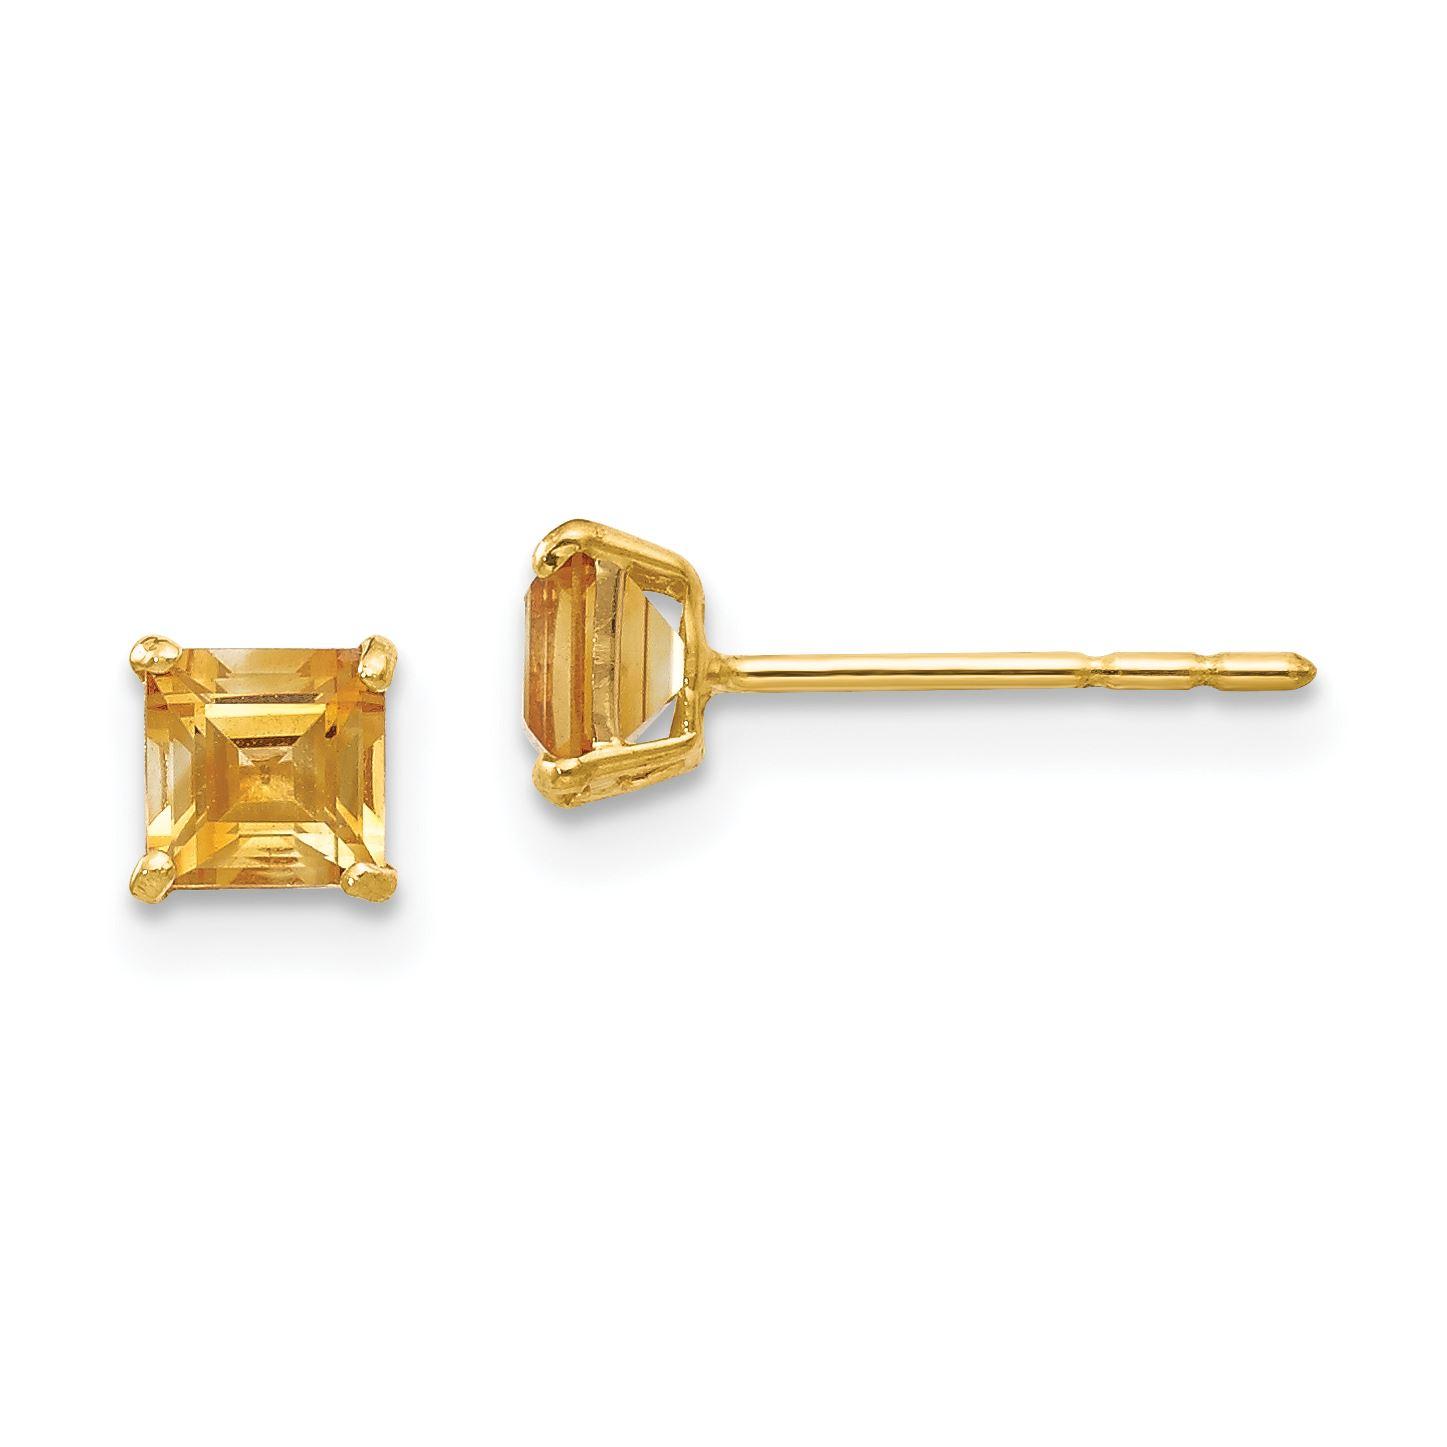 14K Yellow Gold Jewelry Button Earrings 4 mm 9 mm Madi K CZ Childrens Post Earrings